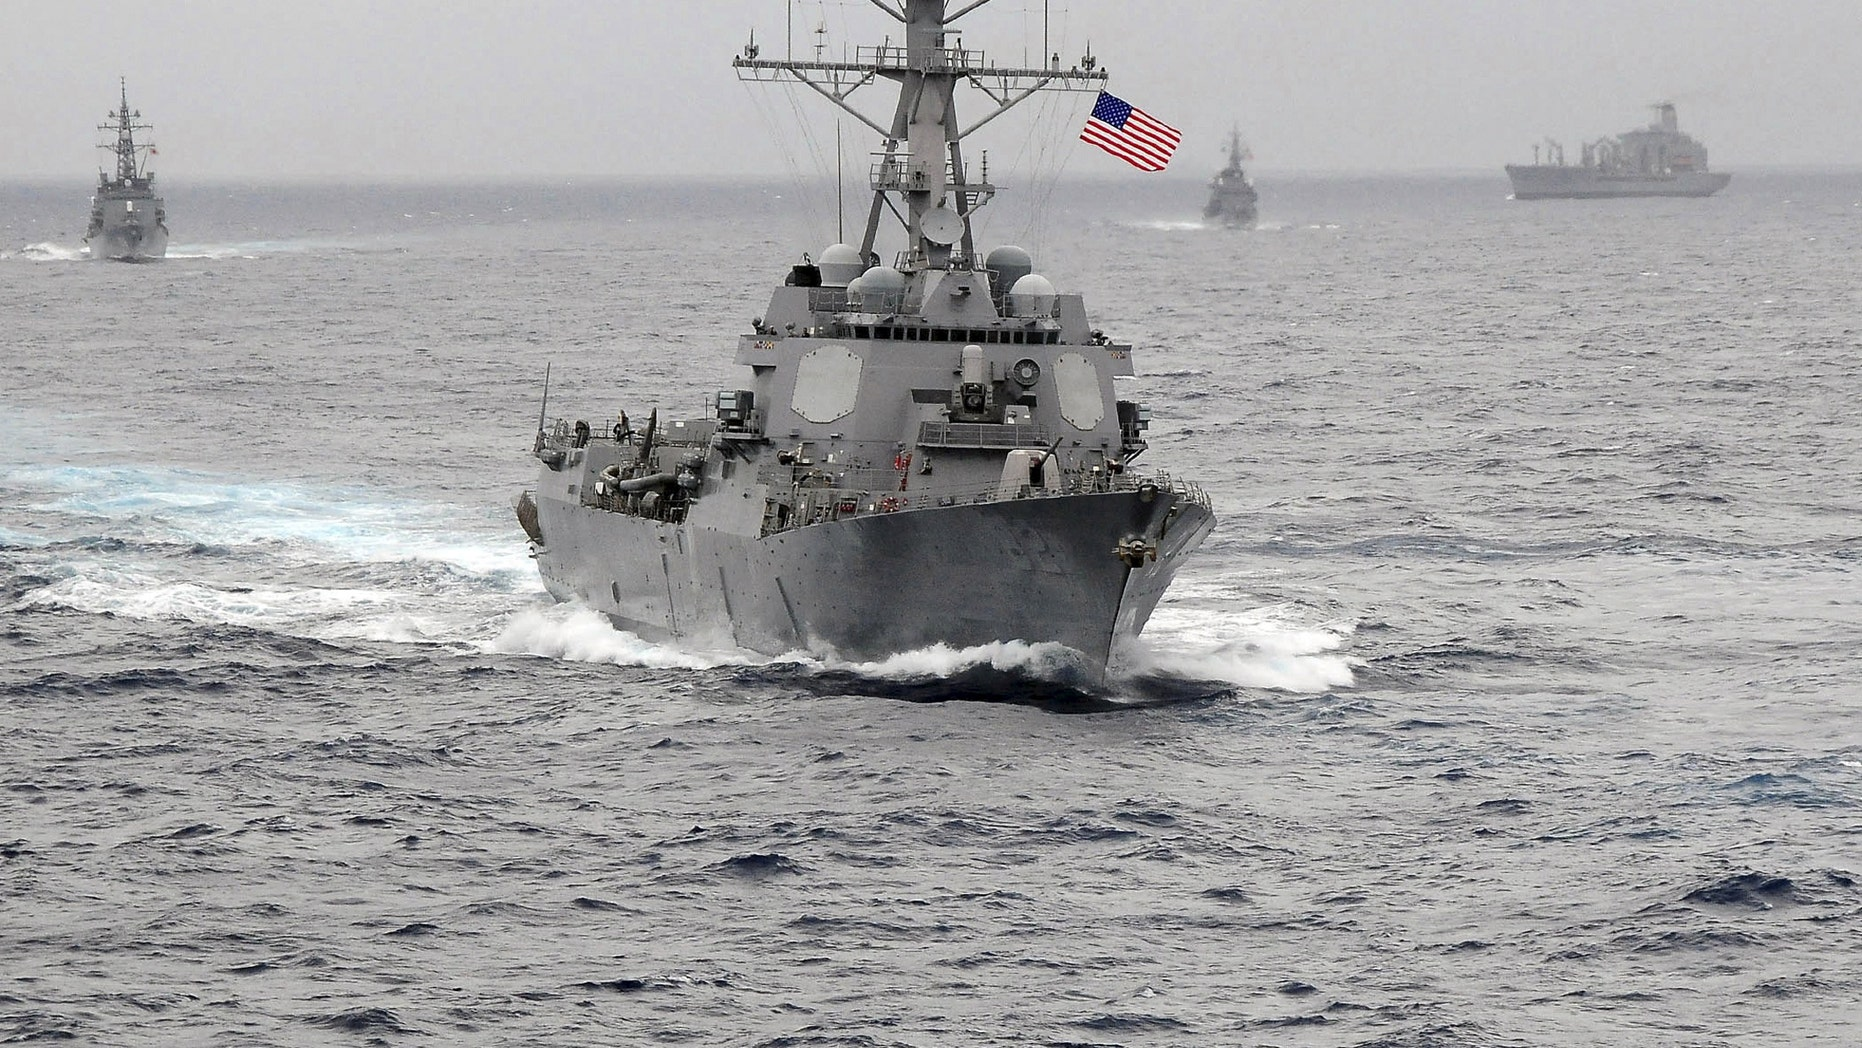 File photo - The US Navy guided-missile destroyer USS Lassen. (US Navy/CPO John Hageman/Handout via Reuters/File Photo)